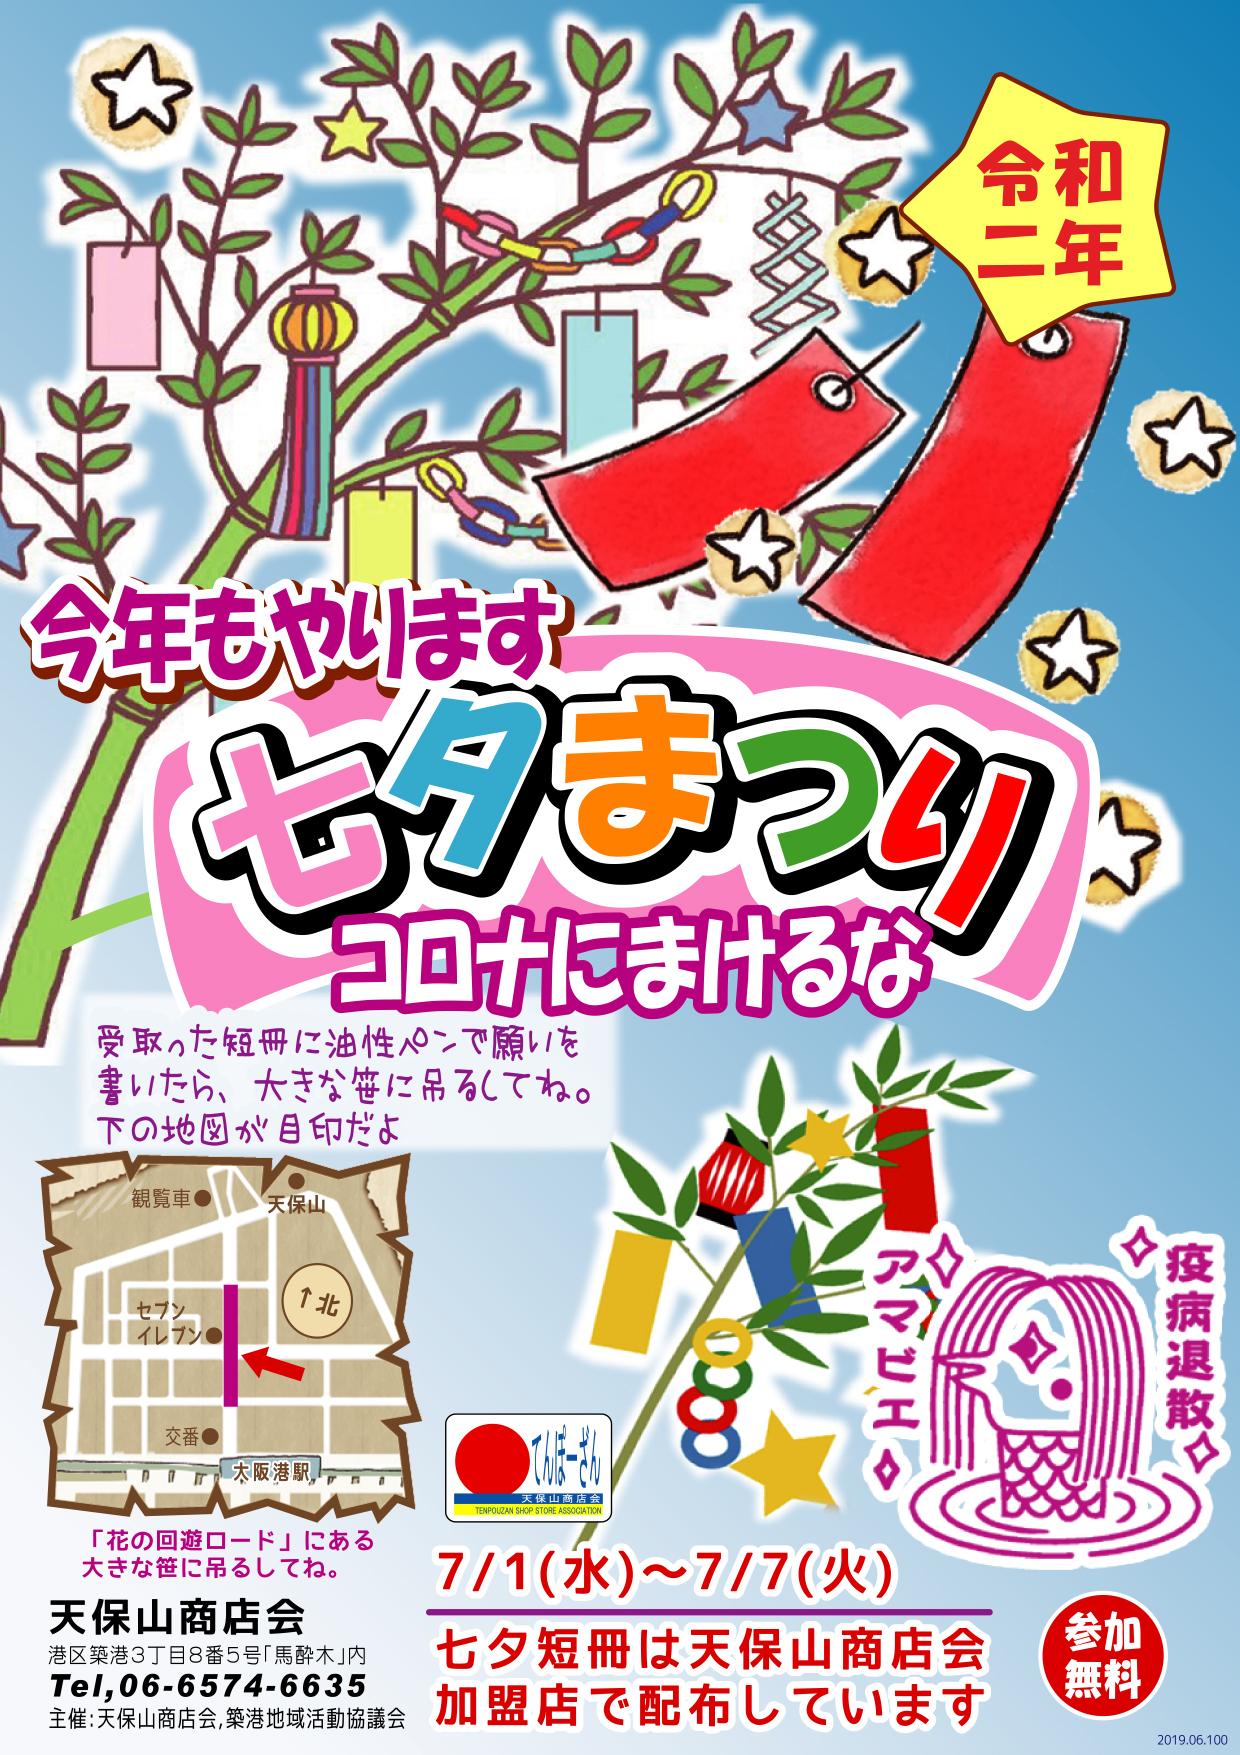 http://tenpouzan.sakura.ne.jp/images/2020-0707.jpg